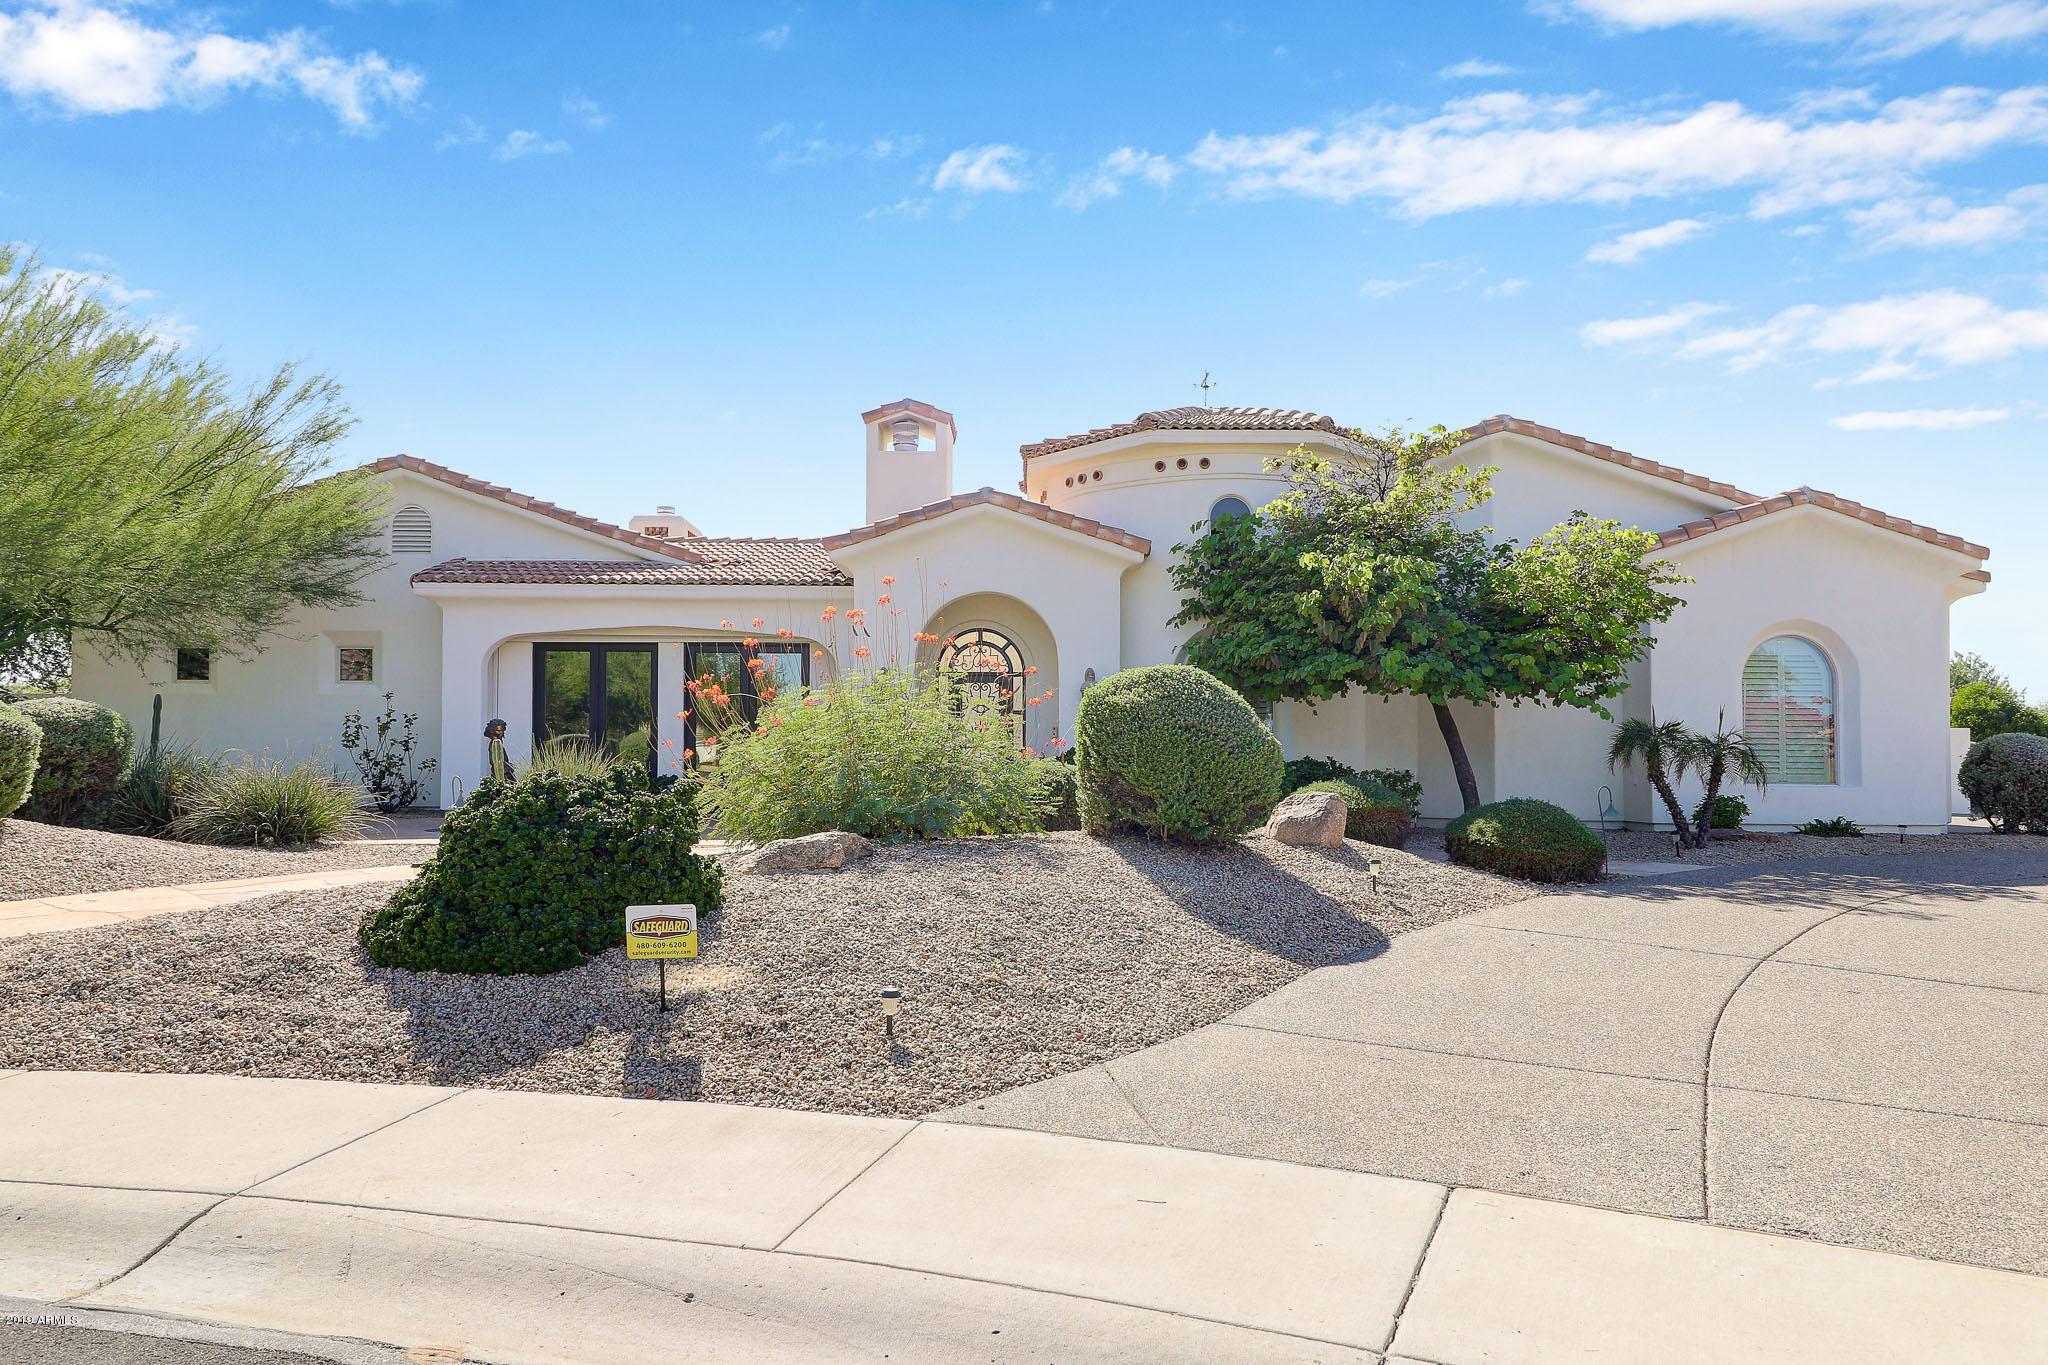 Photo of 14217 W VALLEY VIEW Drive, Litchfield Park, AZ 85340